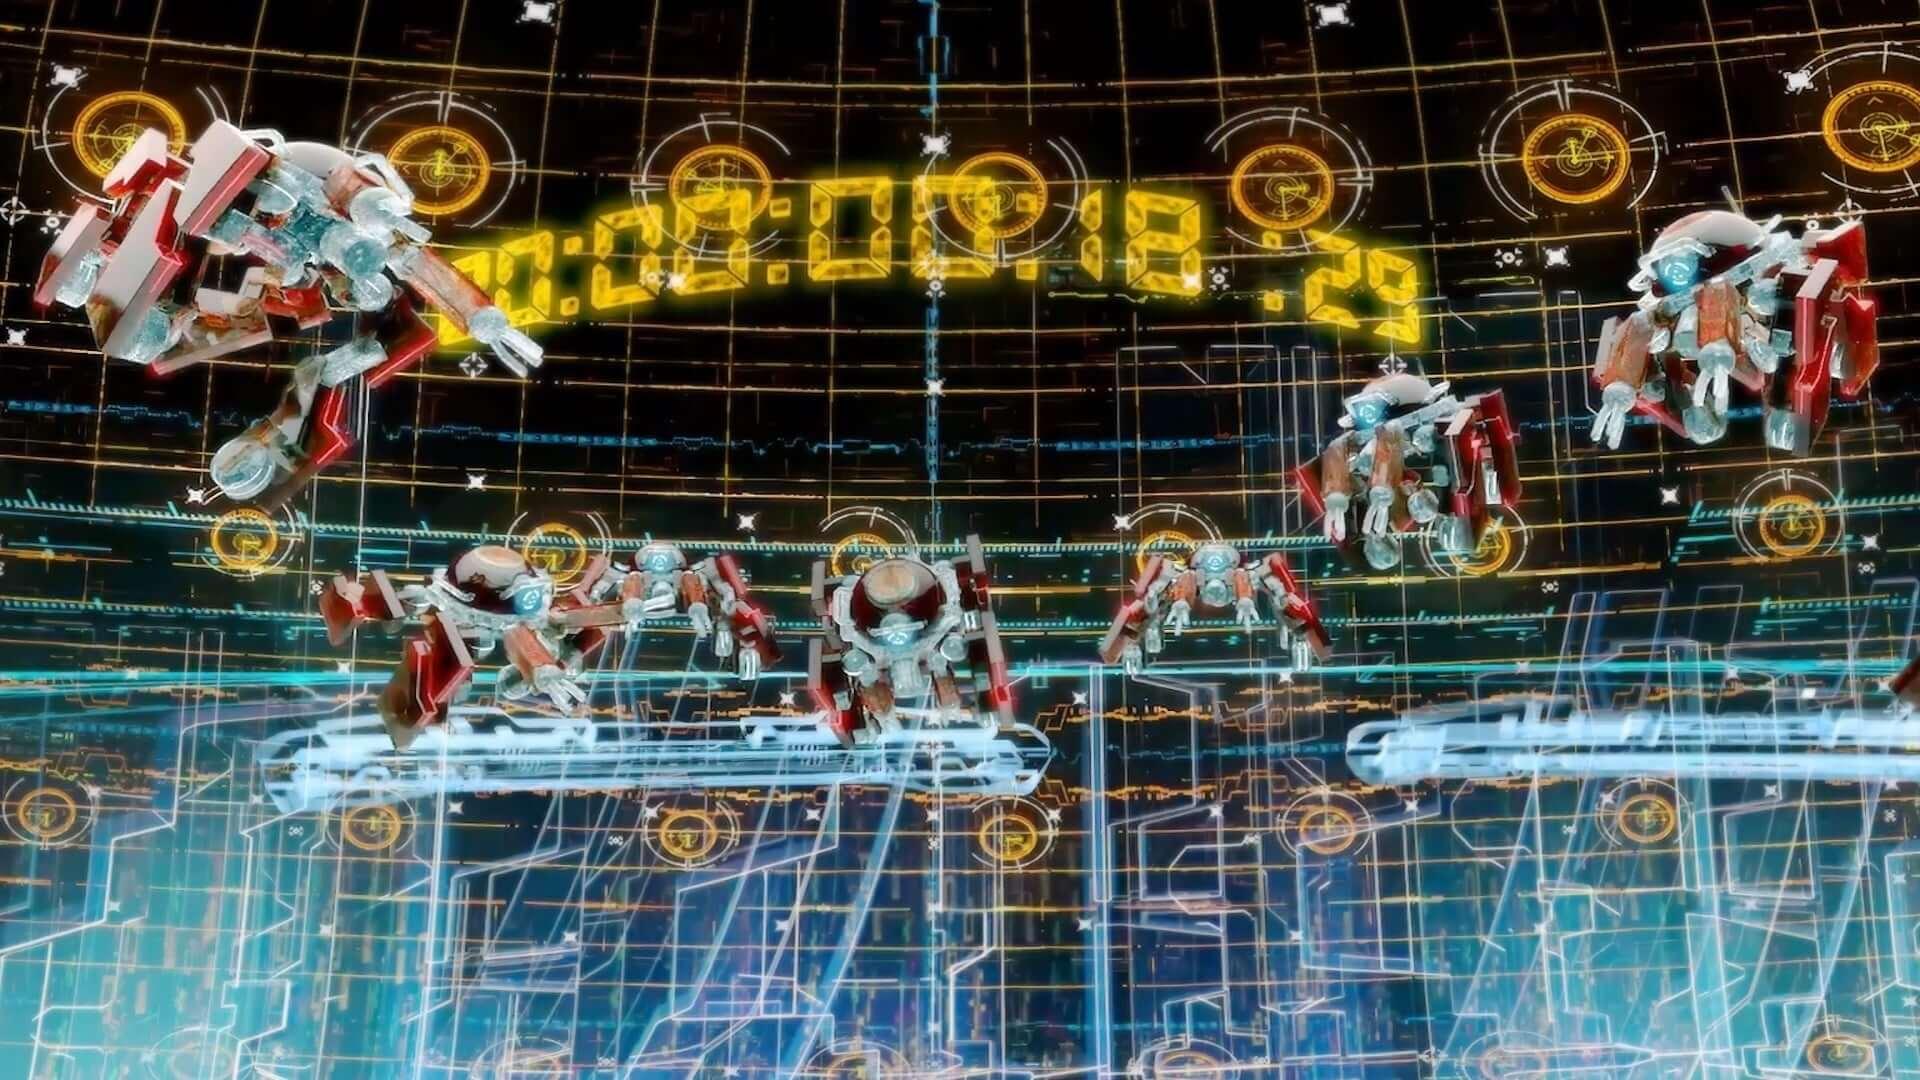 VR作品としては日本初!『攻殻機動隊 GHOST CHASER』が<第76回ベネチア国際映画祭>に正式招待 film190725ghost-chaser_6-1920x1080